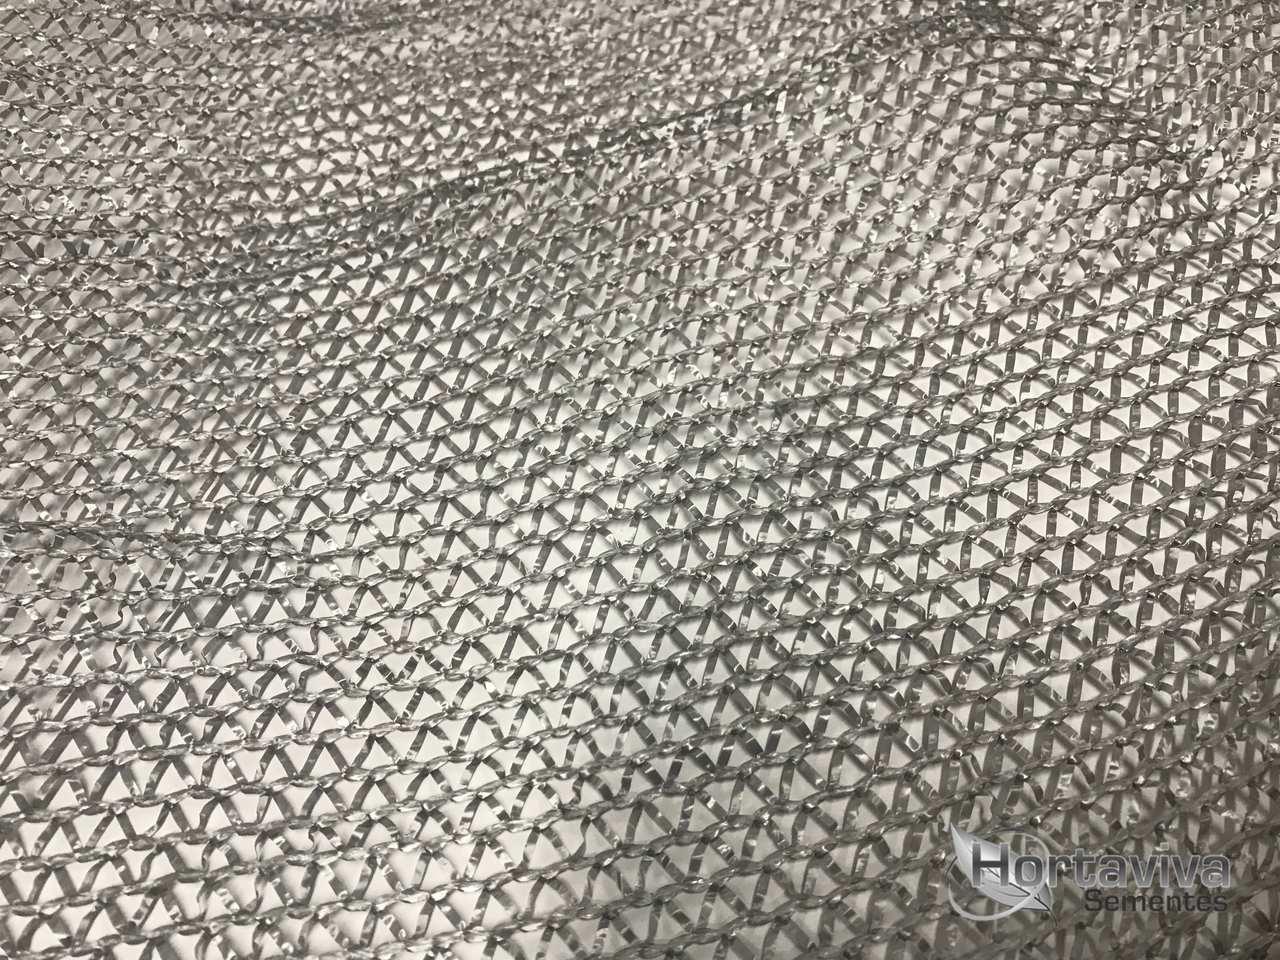 Tela de Sombreamento Prata Termo Refletora Freshnet 50% - Largura: 10 Metros